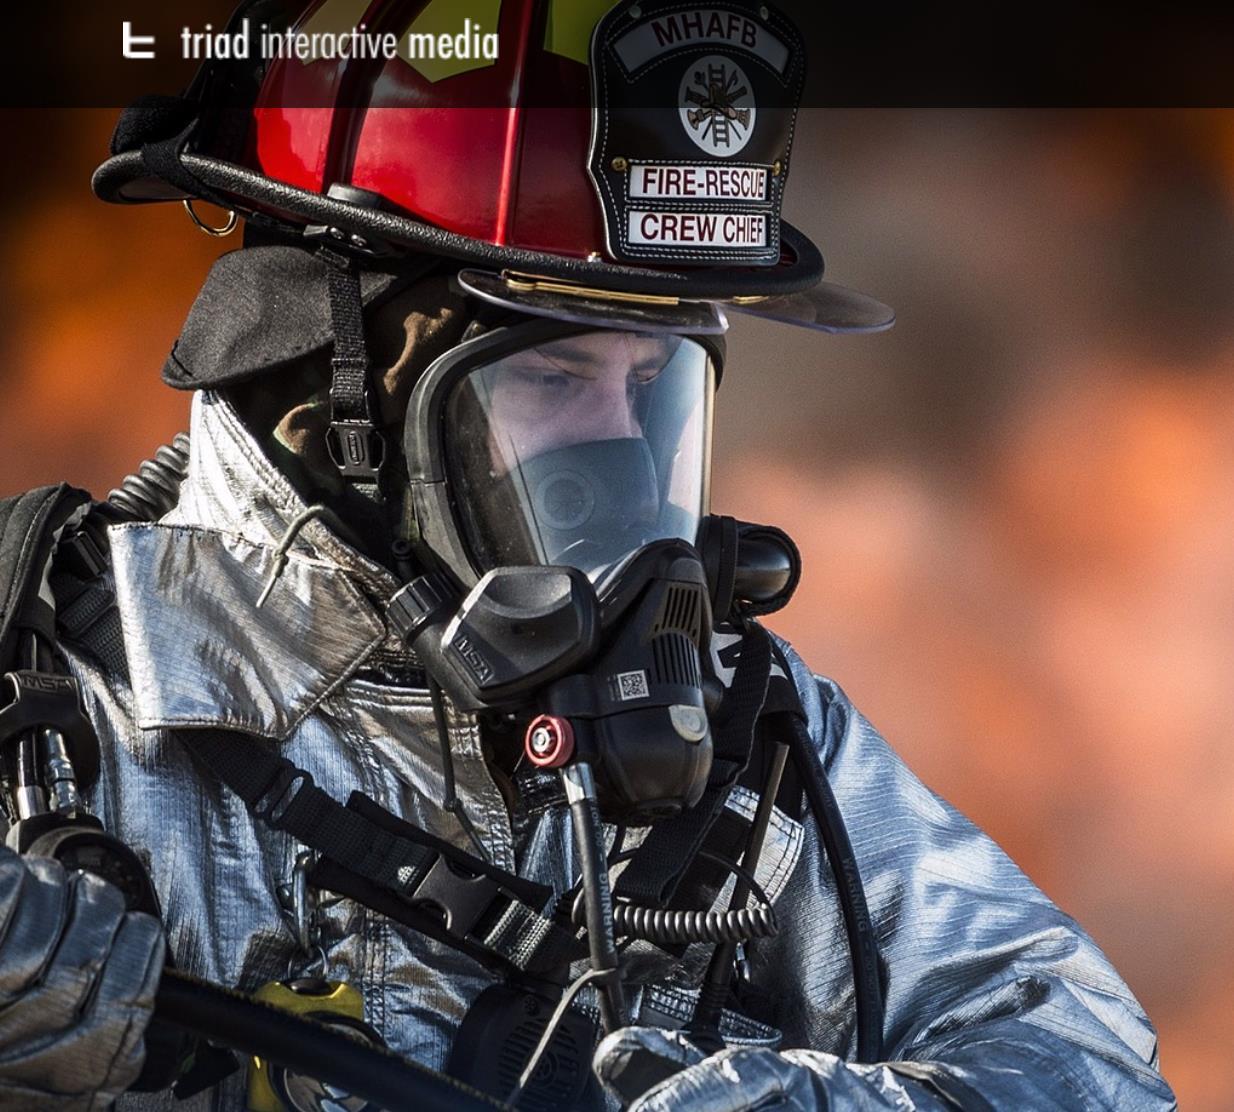 firefighter Training Triad Interactive Media